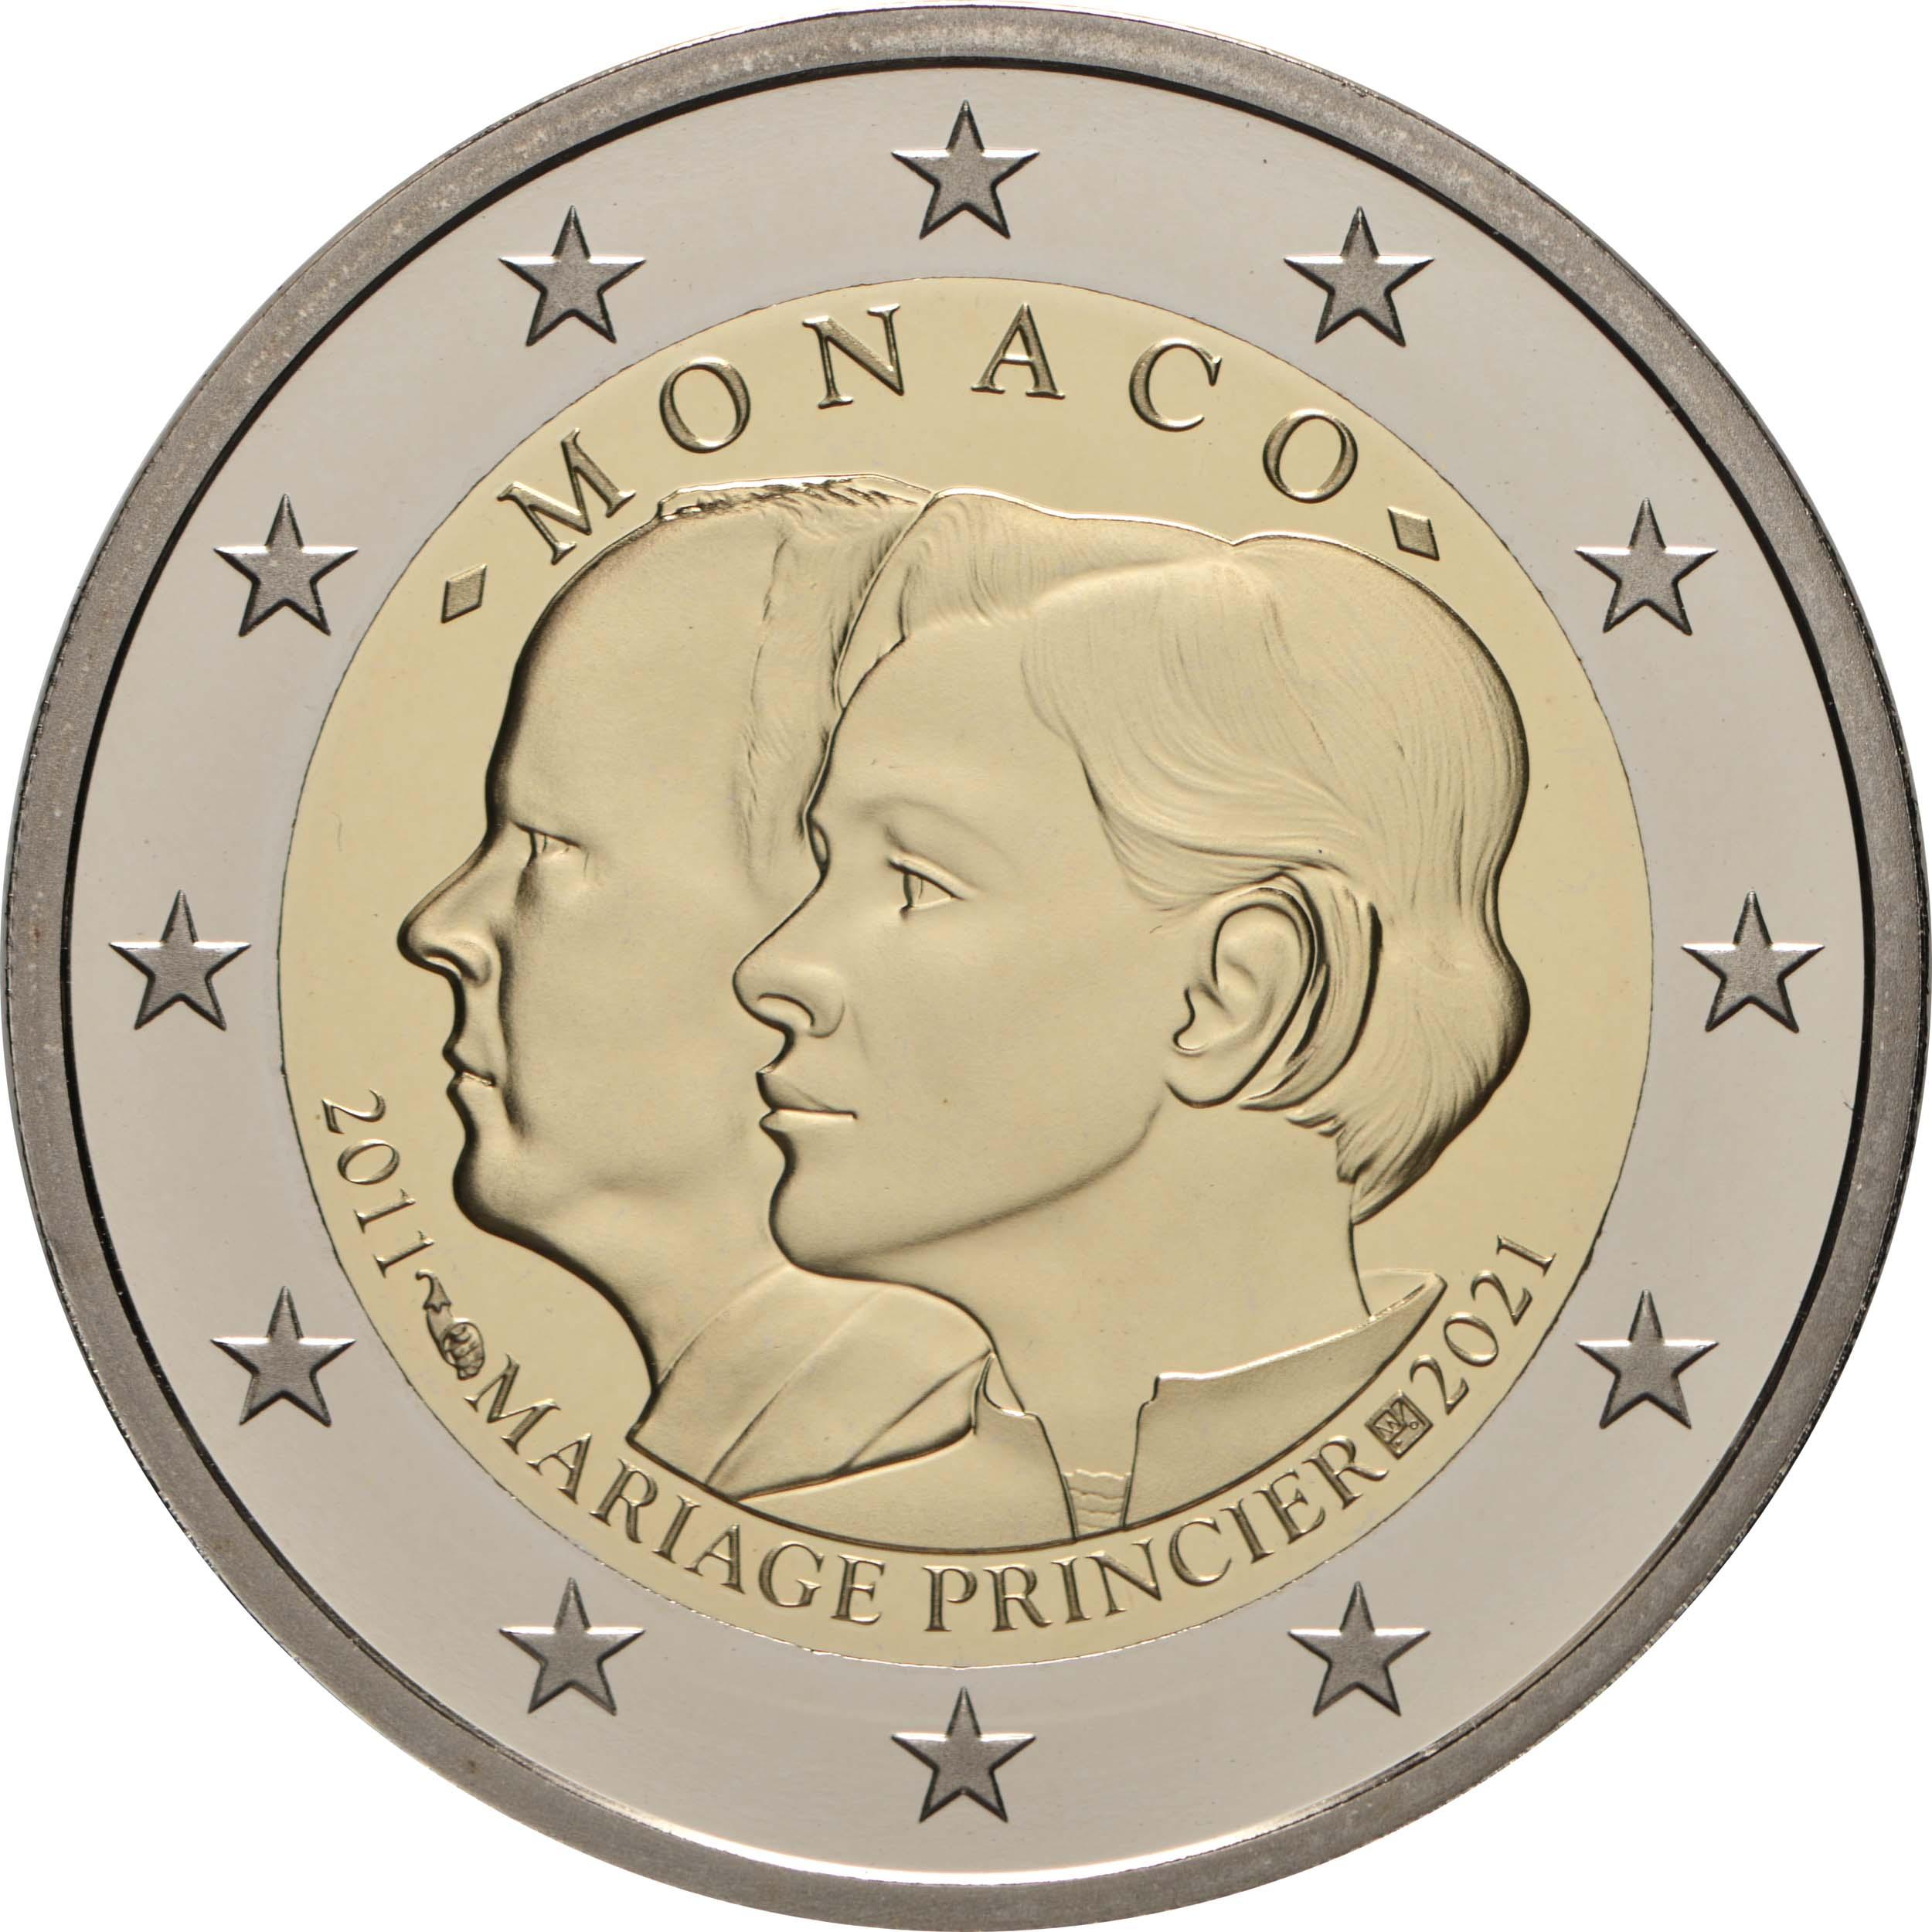 2021 420 Monaco 10 J. Hochzeit.jpg